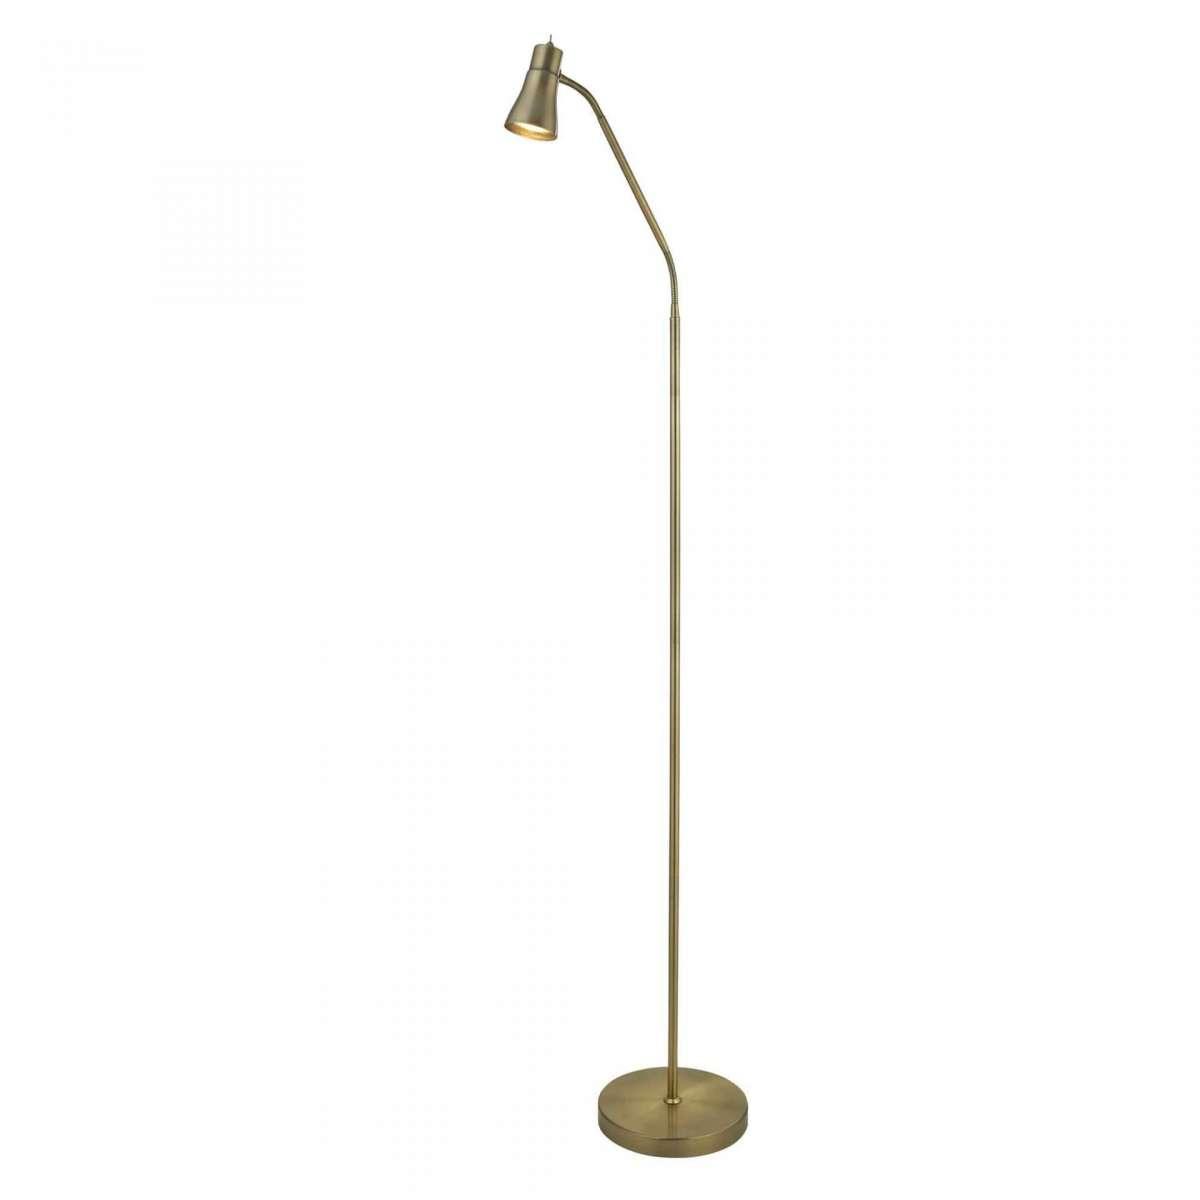 Fusion Antique Brass Floor Lamp with Flexi Head